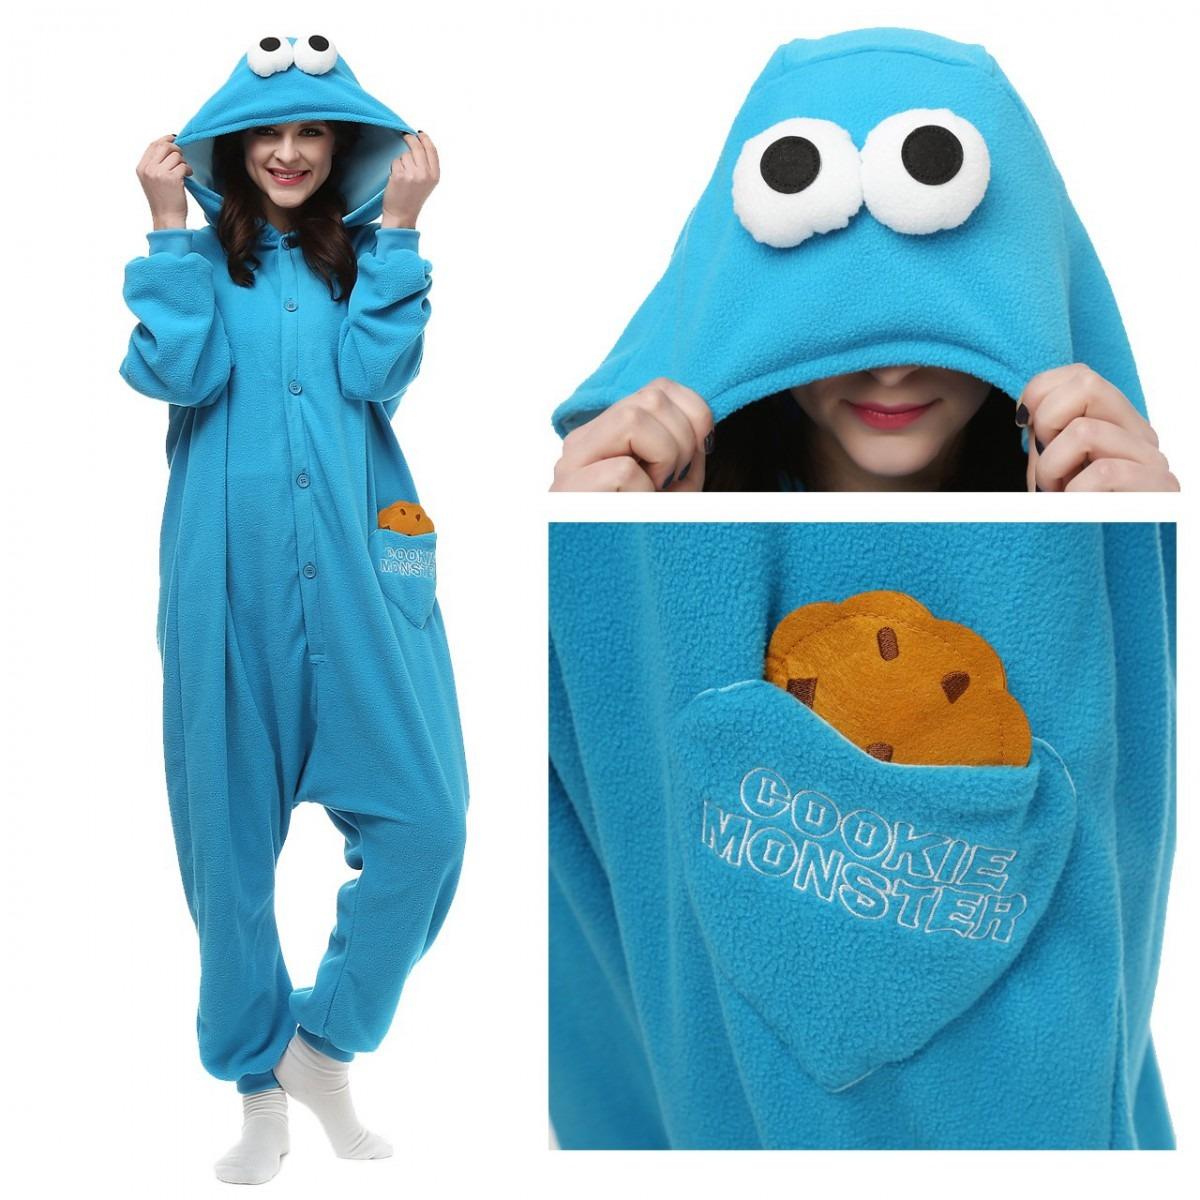 Blue Cookie Monster Onesie, Blue Cookie Monster Pajamas For Women